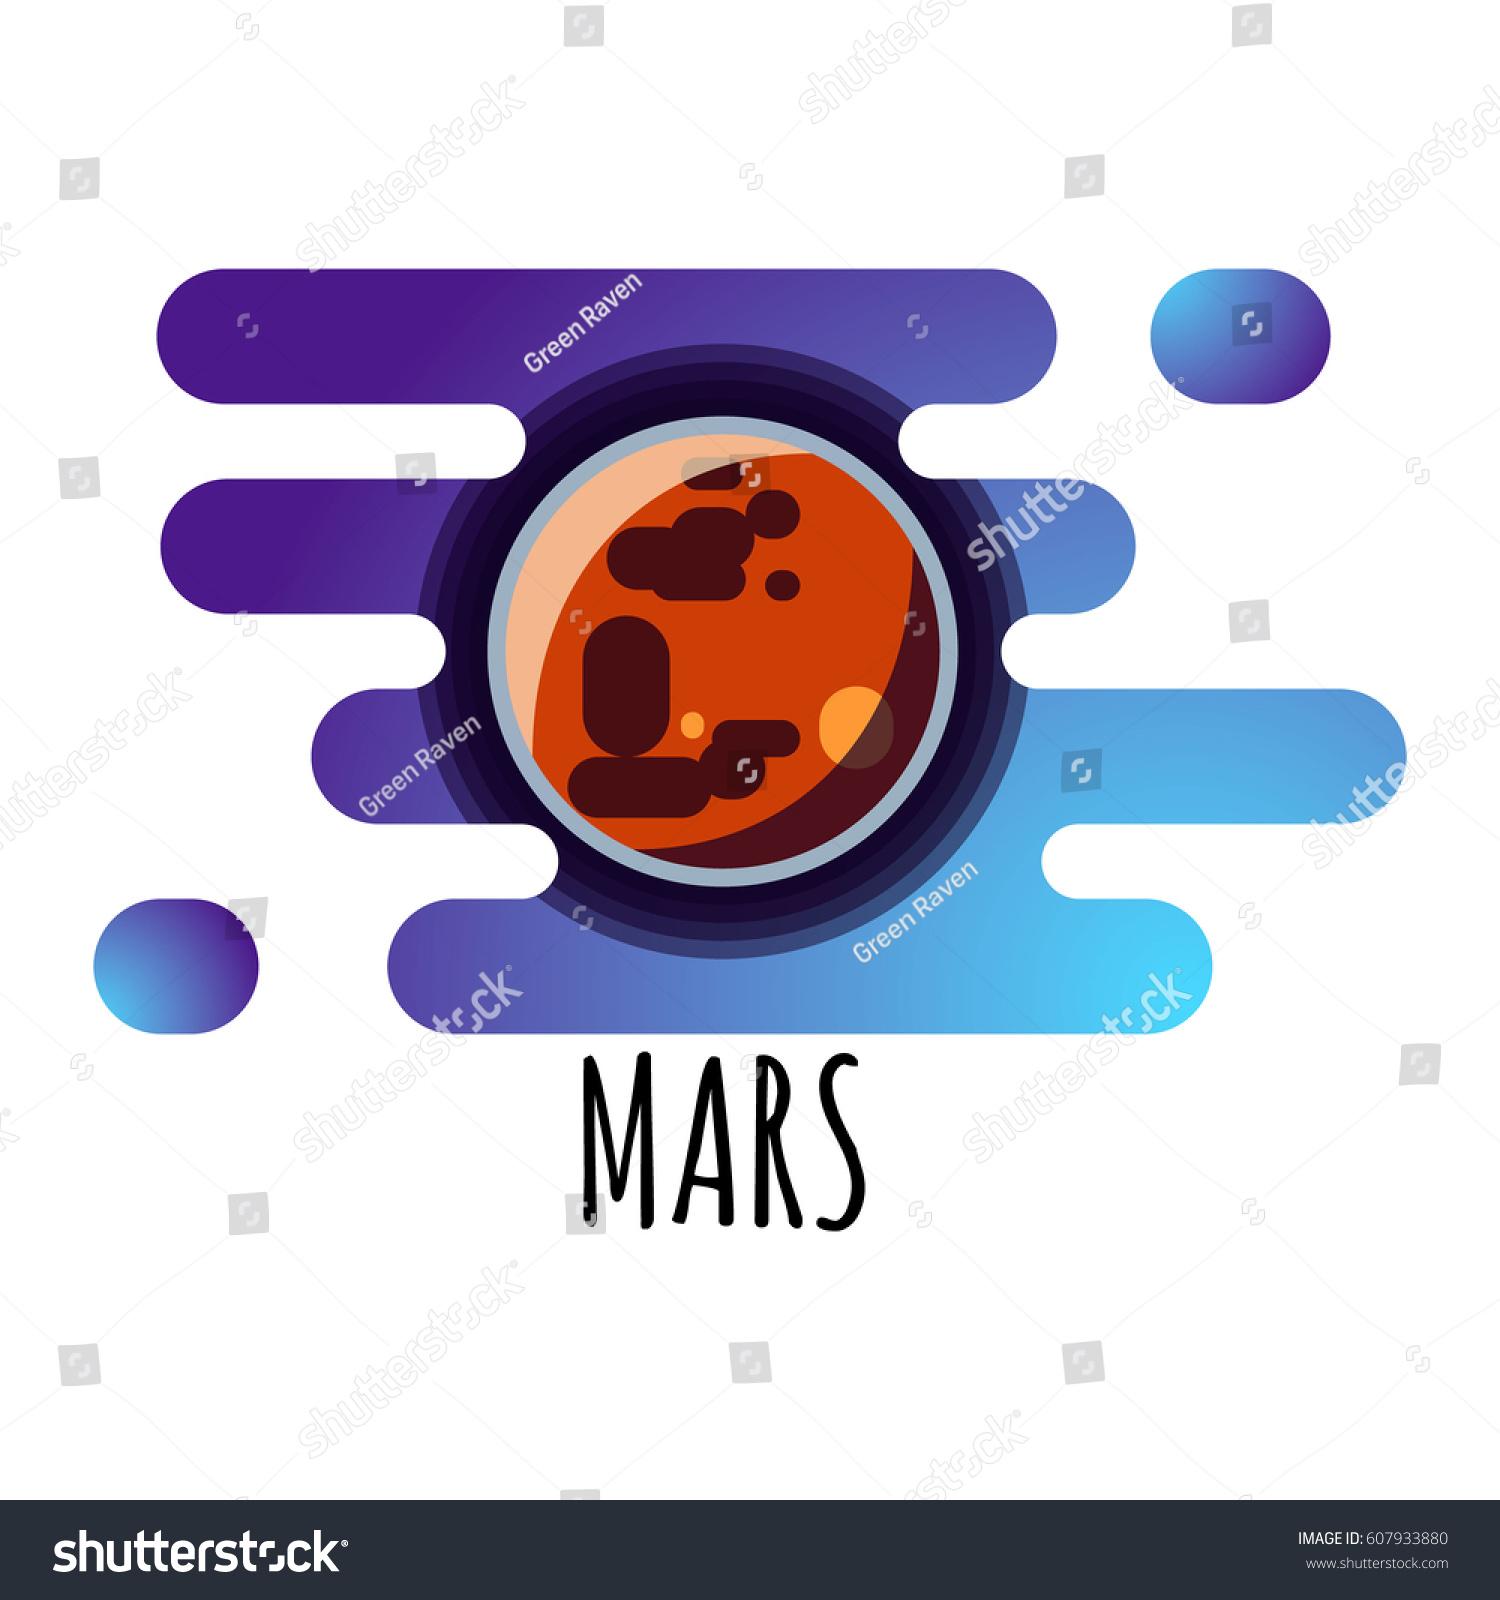 mars planet vector - photo #30